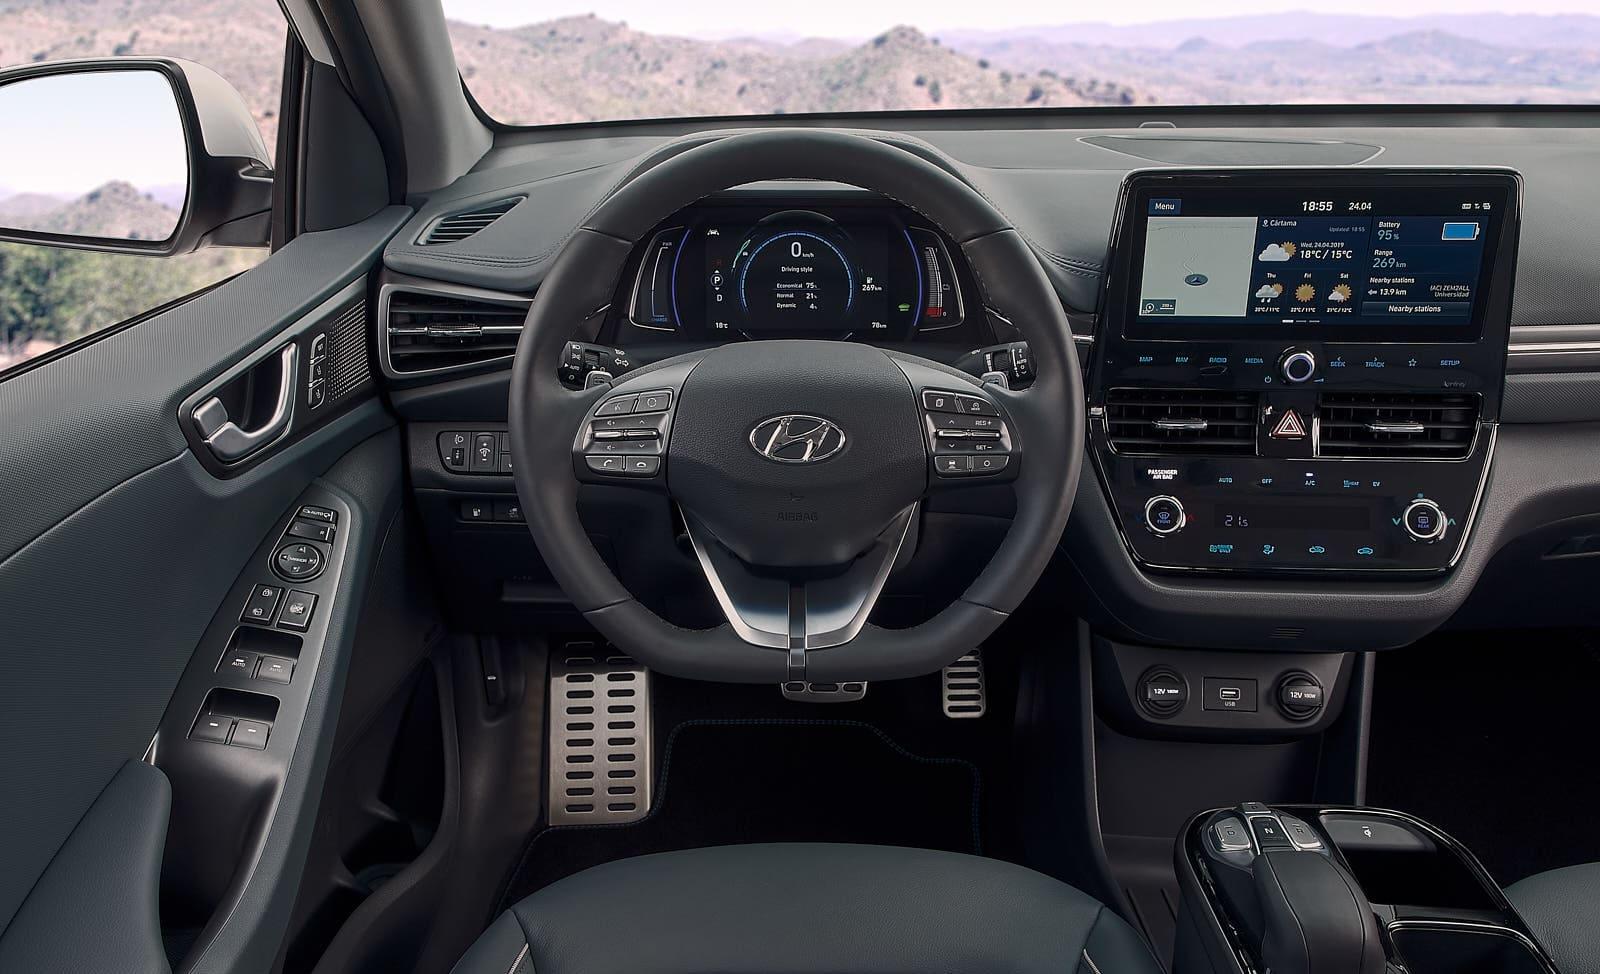 Hyundai S Ioniq Ev Gets A Bigger Battery And More Connectivity